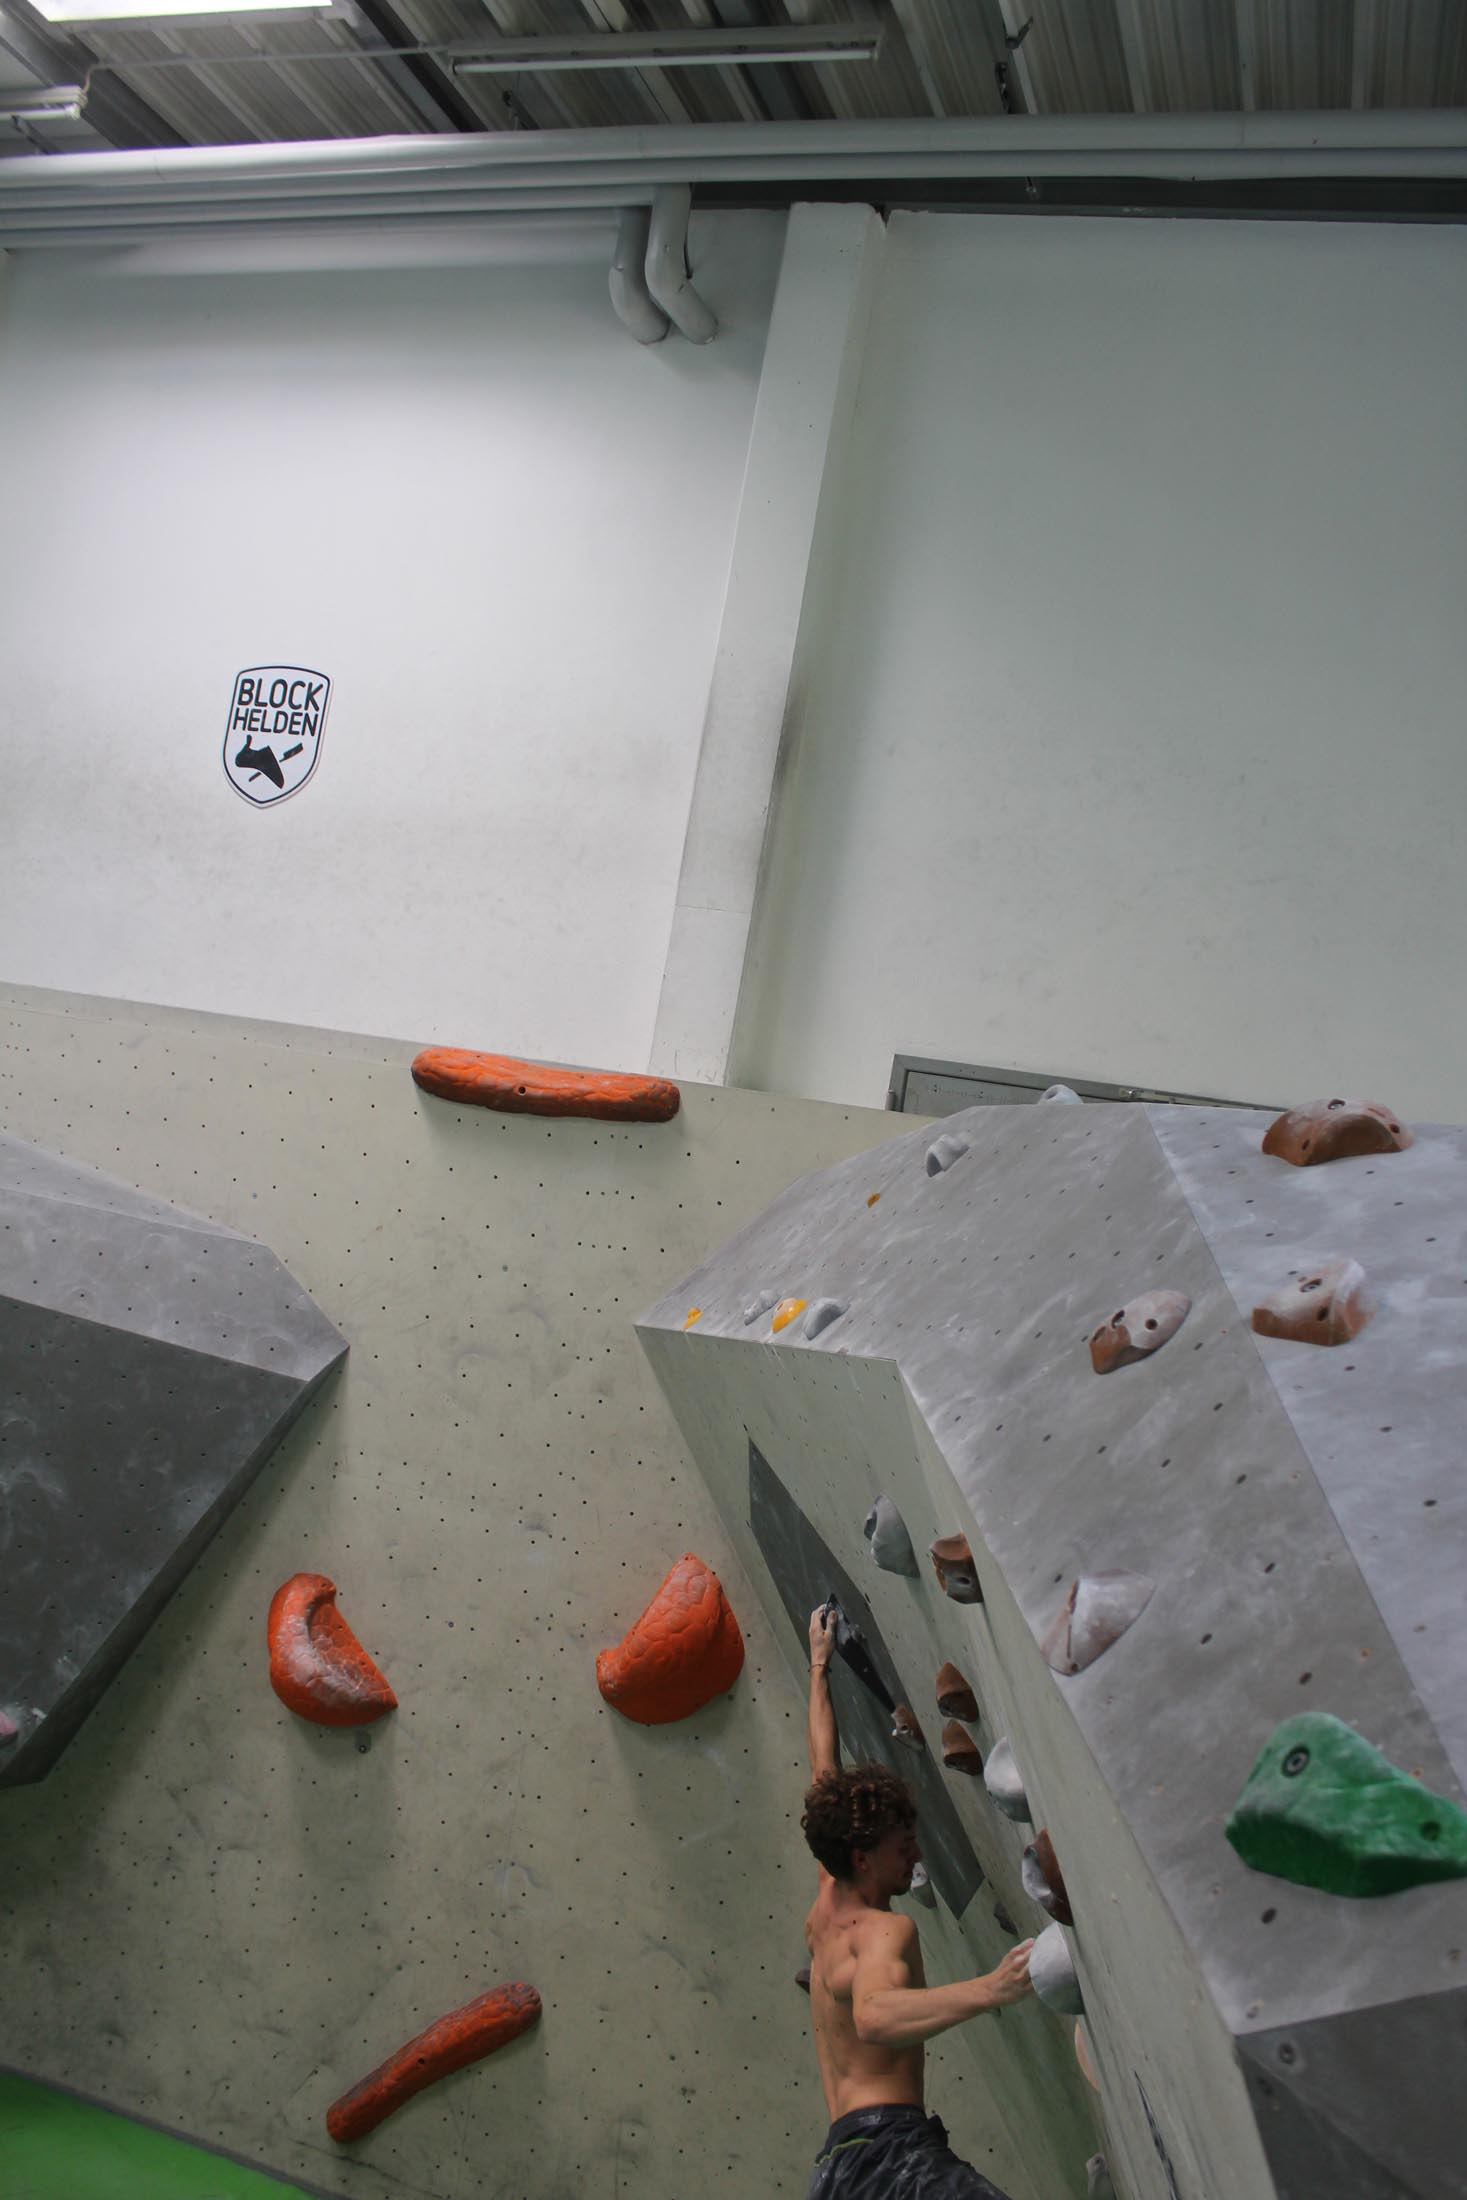 Quali, internationaler bouldercup Frankenjura 2016, BLOCKHELDEN Erlangen, Mammut, Bergfreunde.de, Boulderwettkampf07092016218